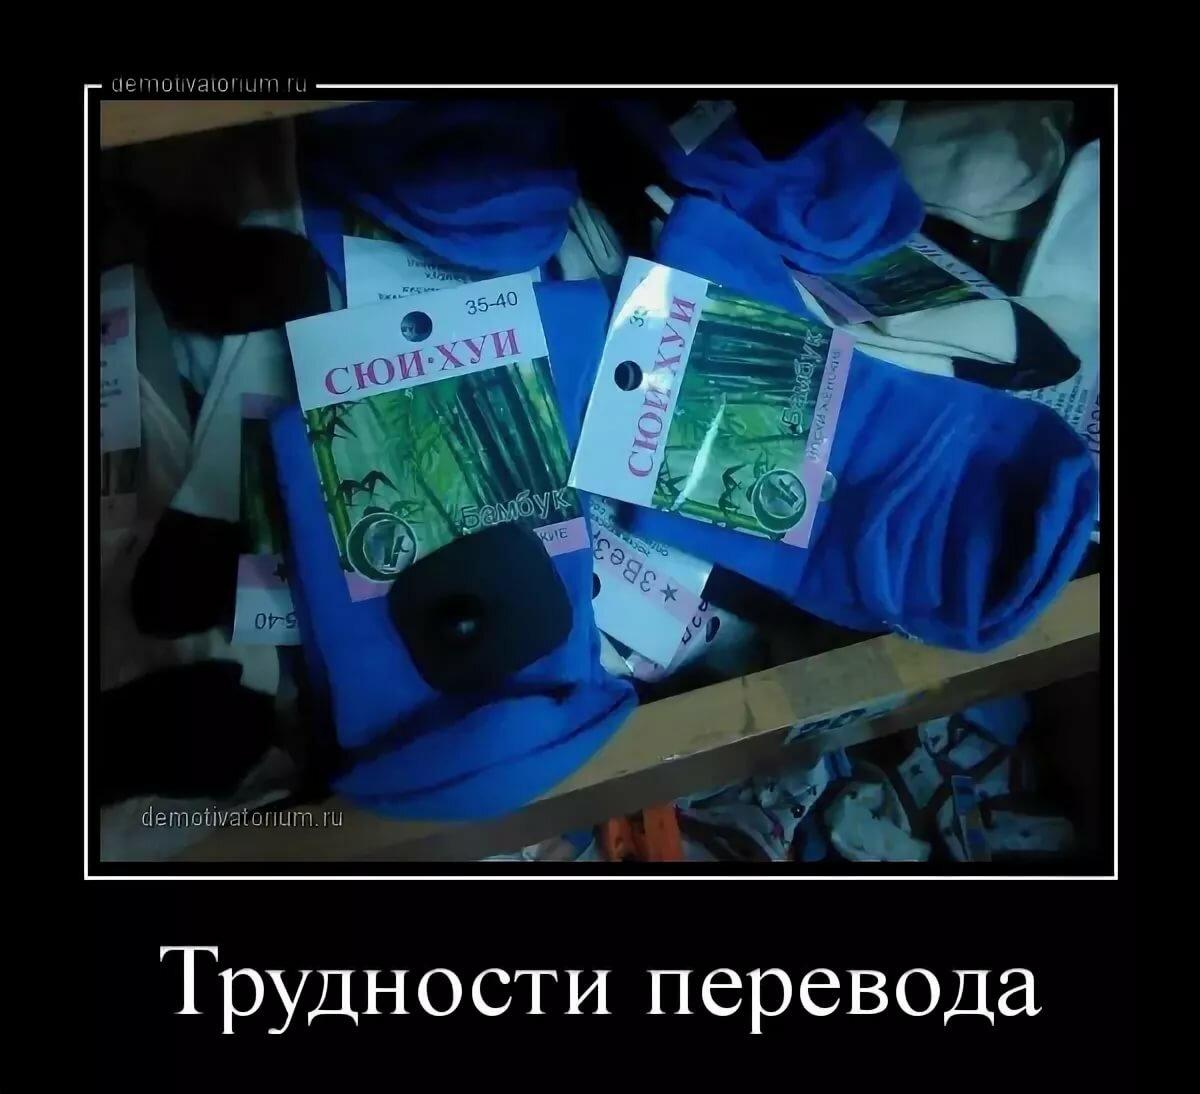 Трудности перевода смешные картинки